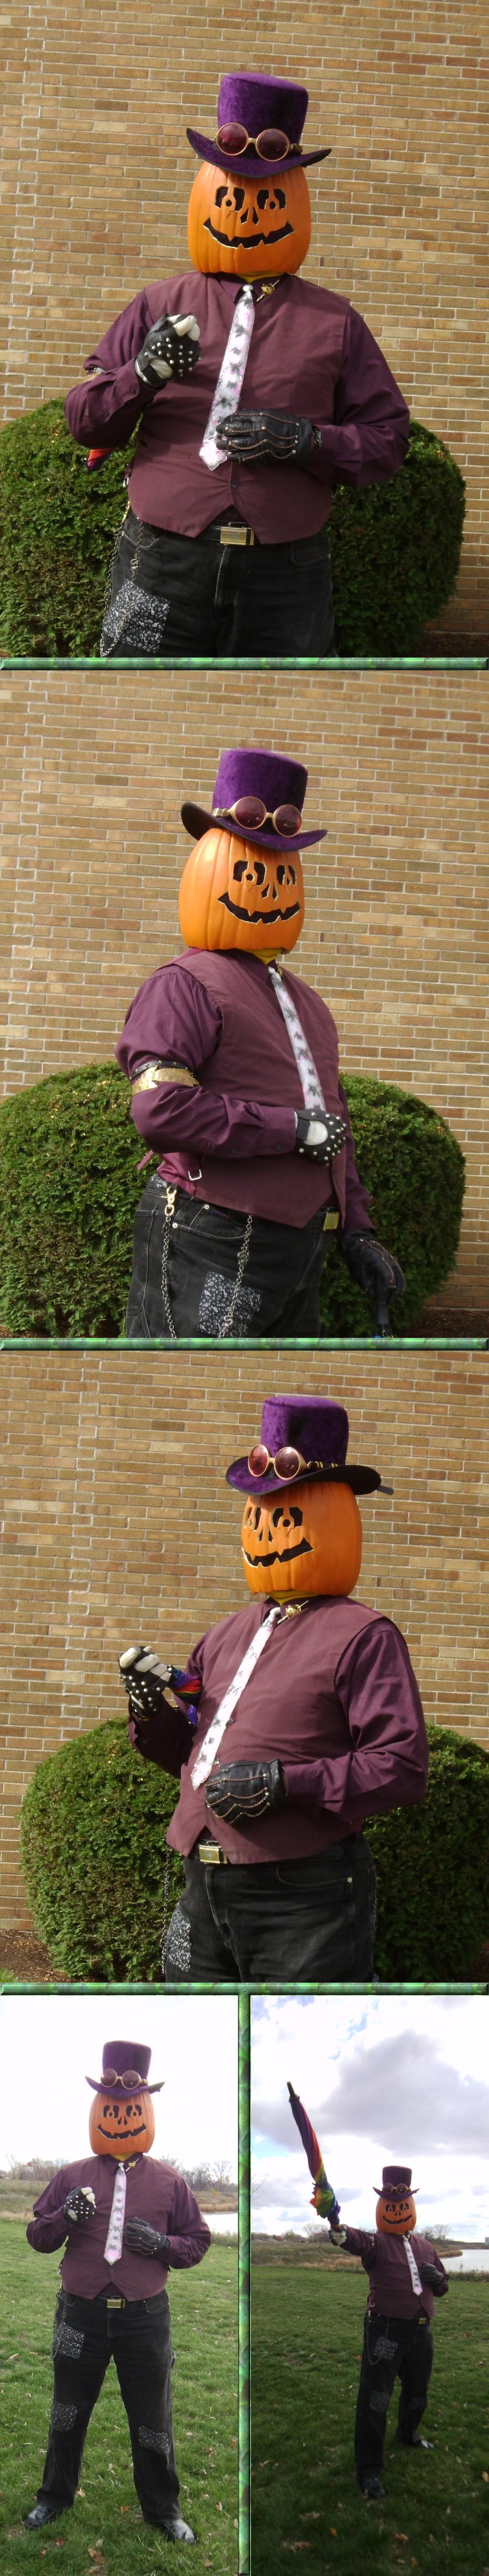 Gourdon Pumpkinhead at Sycamore Pumpkin Parade by Windthin